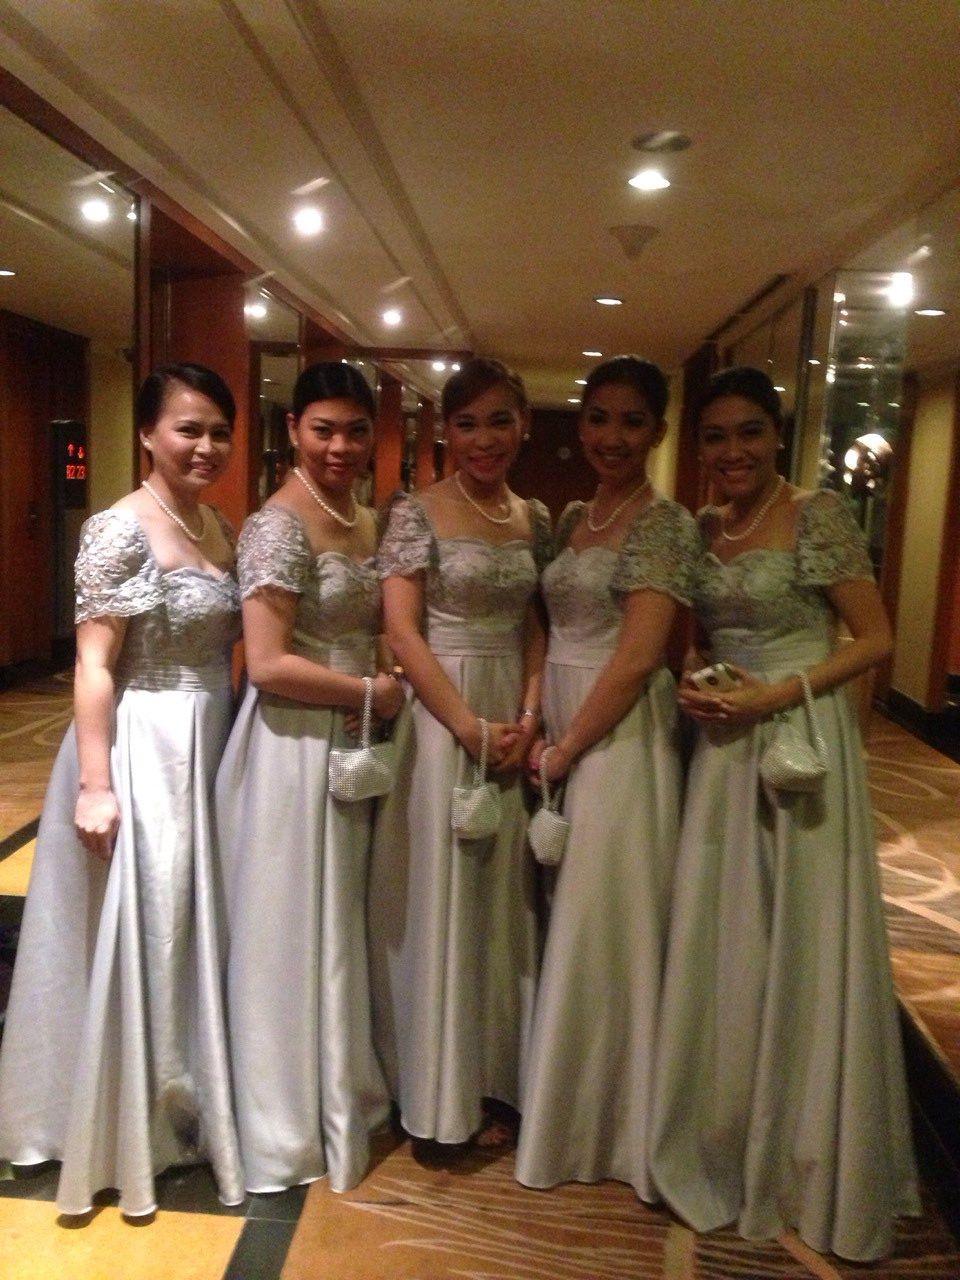 Modern dress des moines - Bridesmaids In Modern Filipiniana Dresses